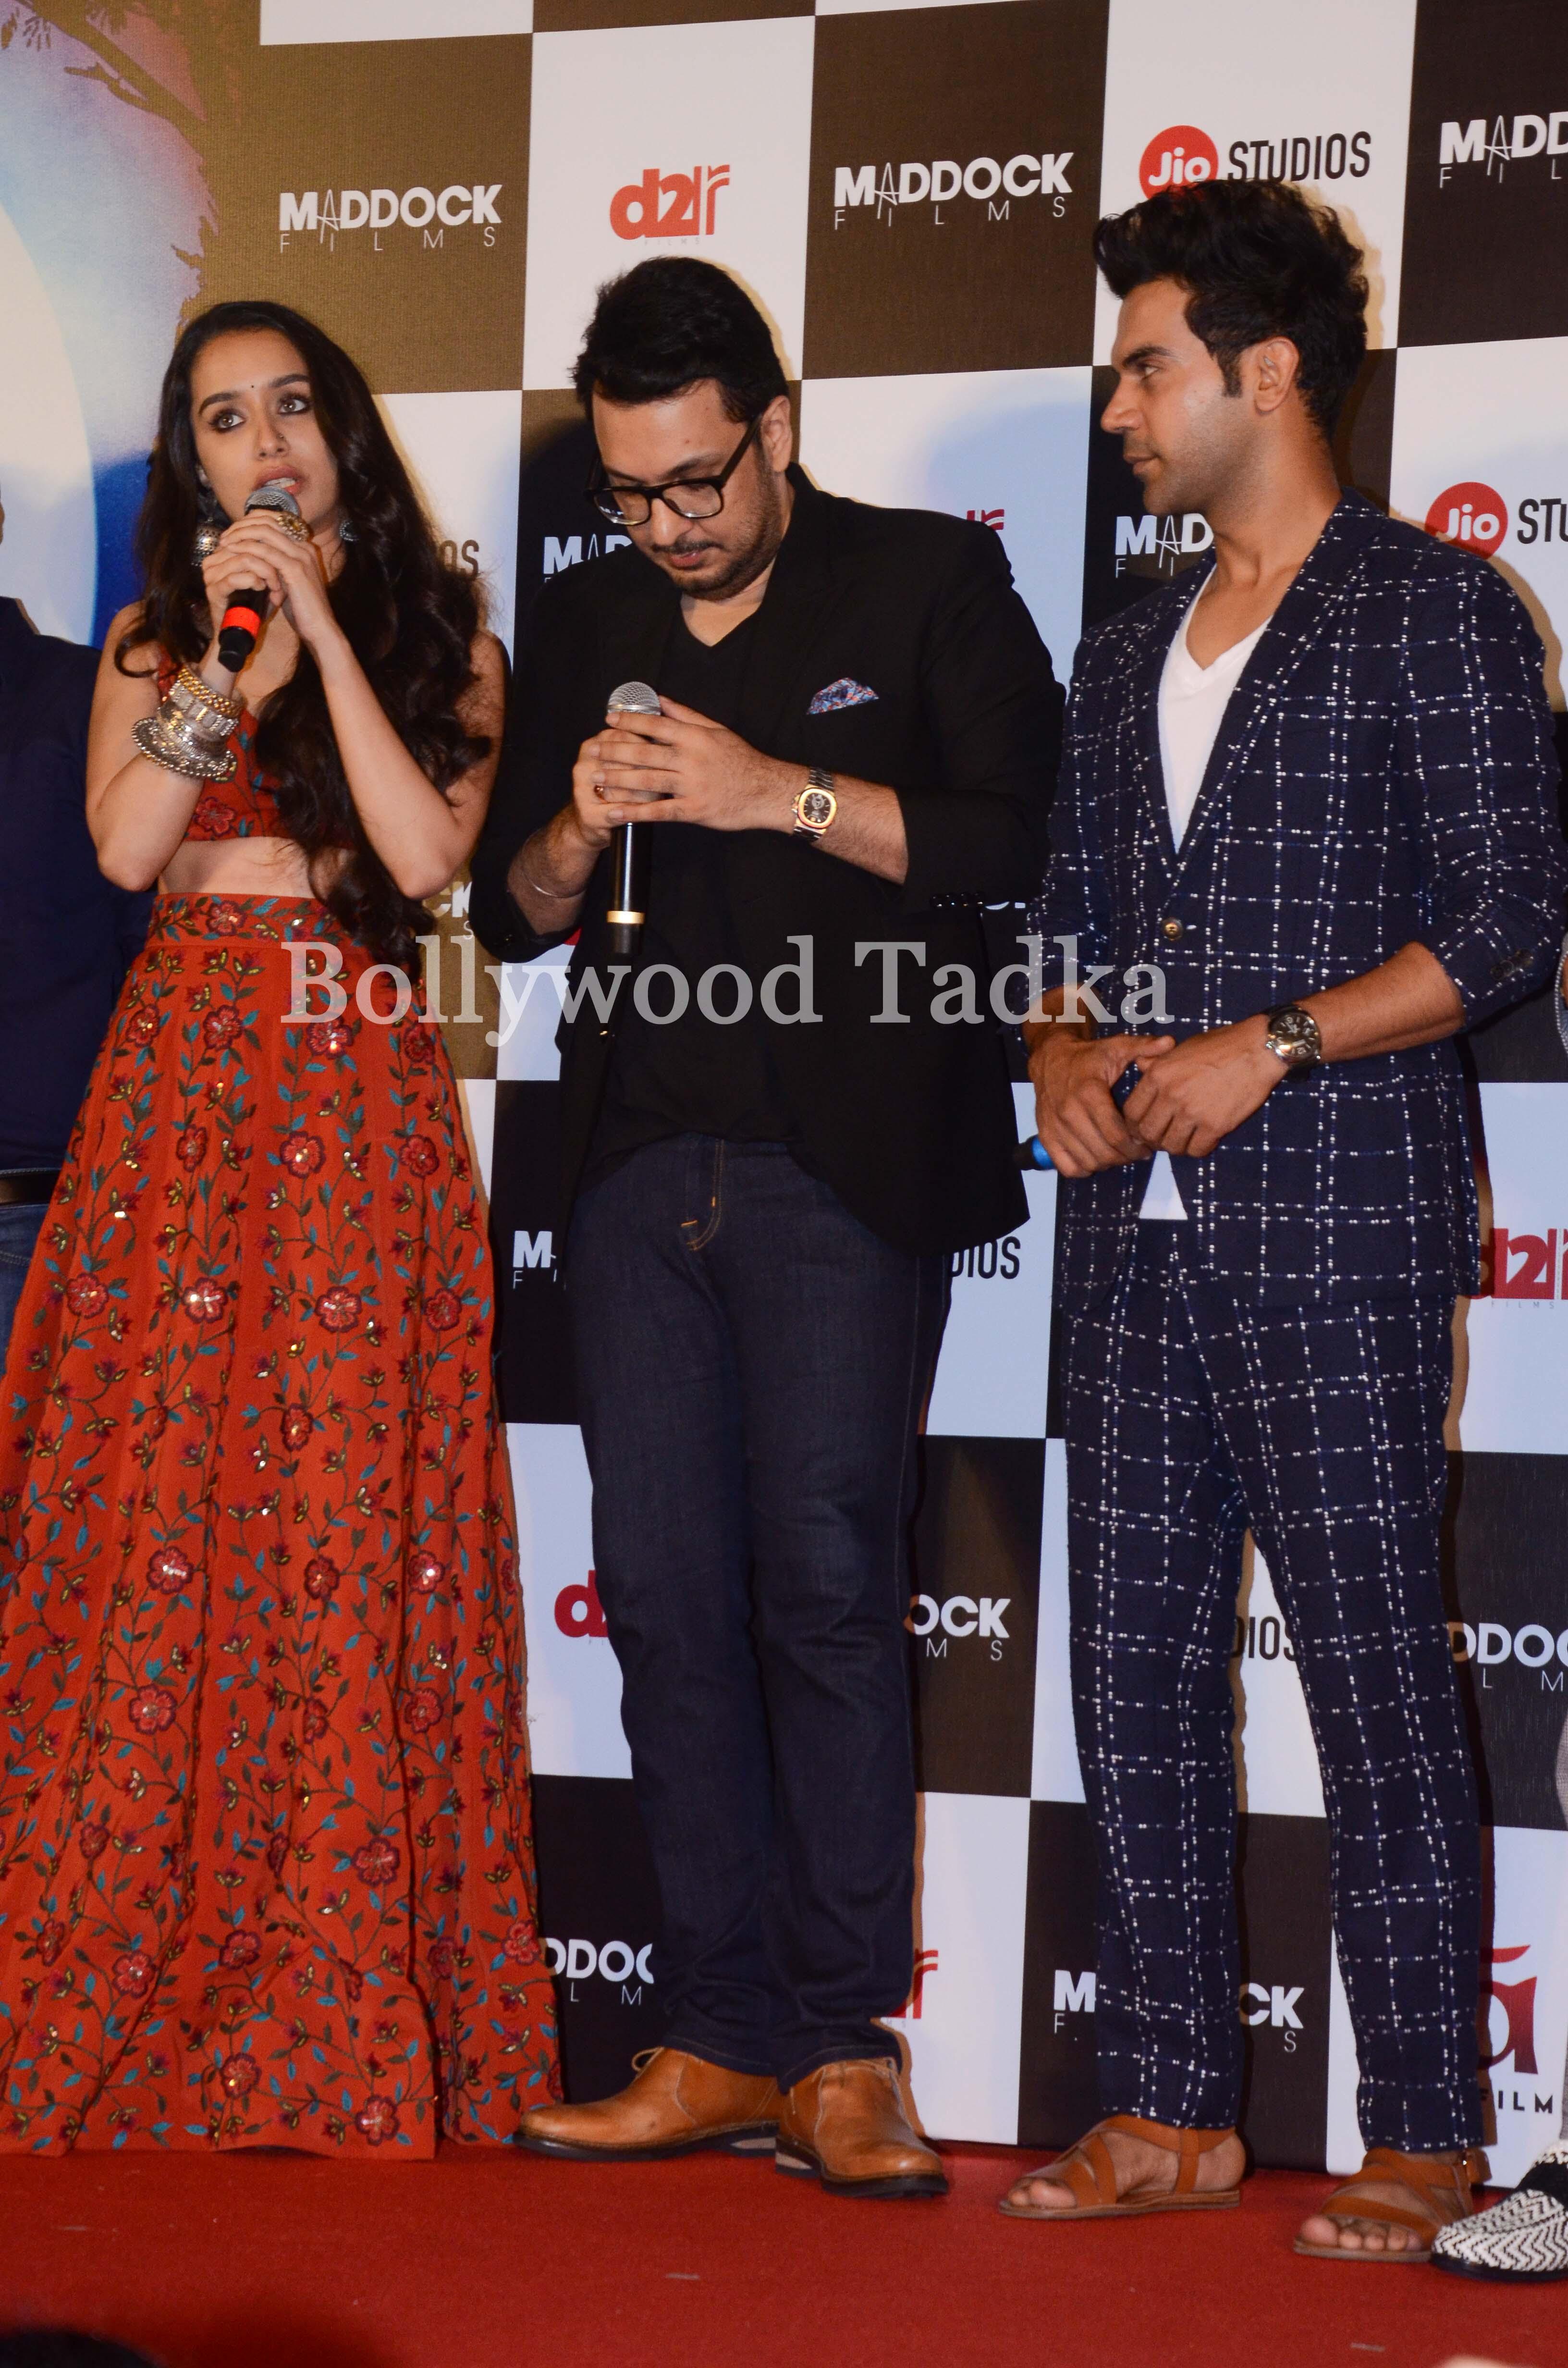 Bollywood Tadka, shraddha kapoor image, raj kumar rao image,श्रद्धा कपूर इमेज, राज कुमार राओ इमेज